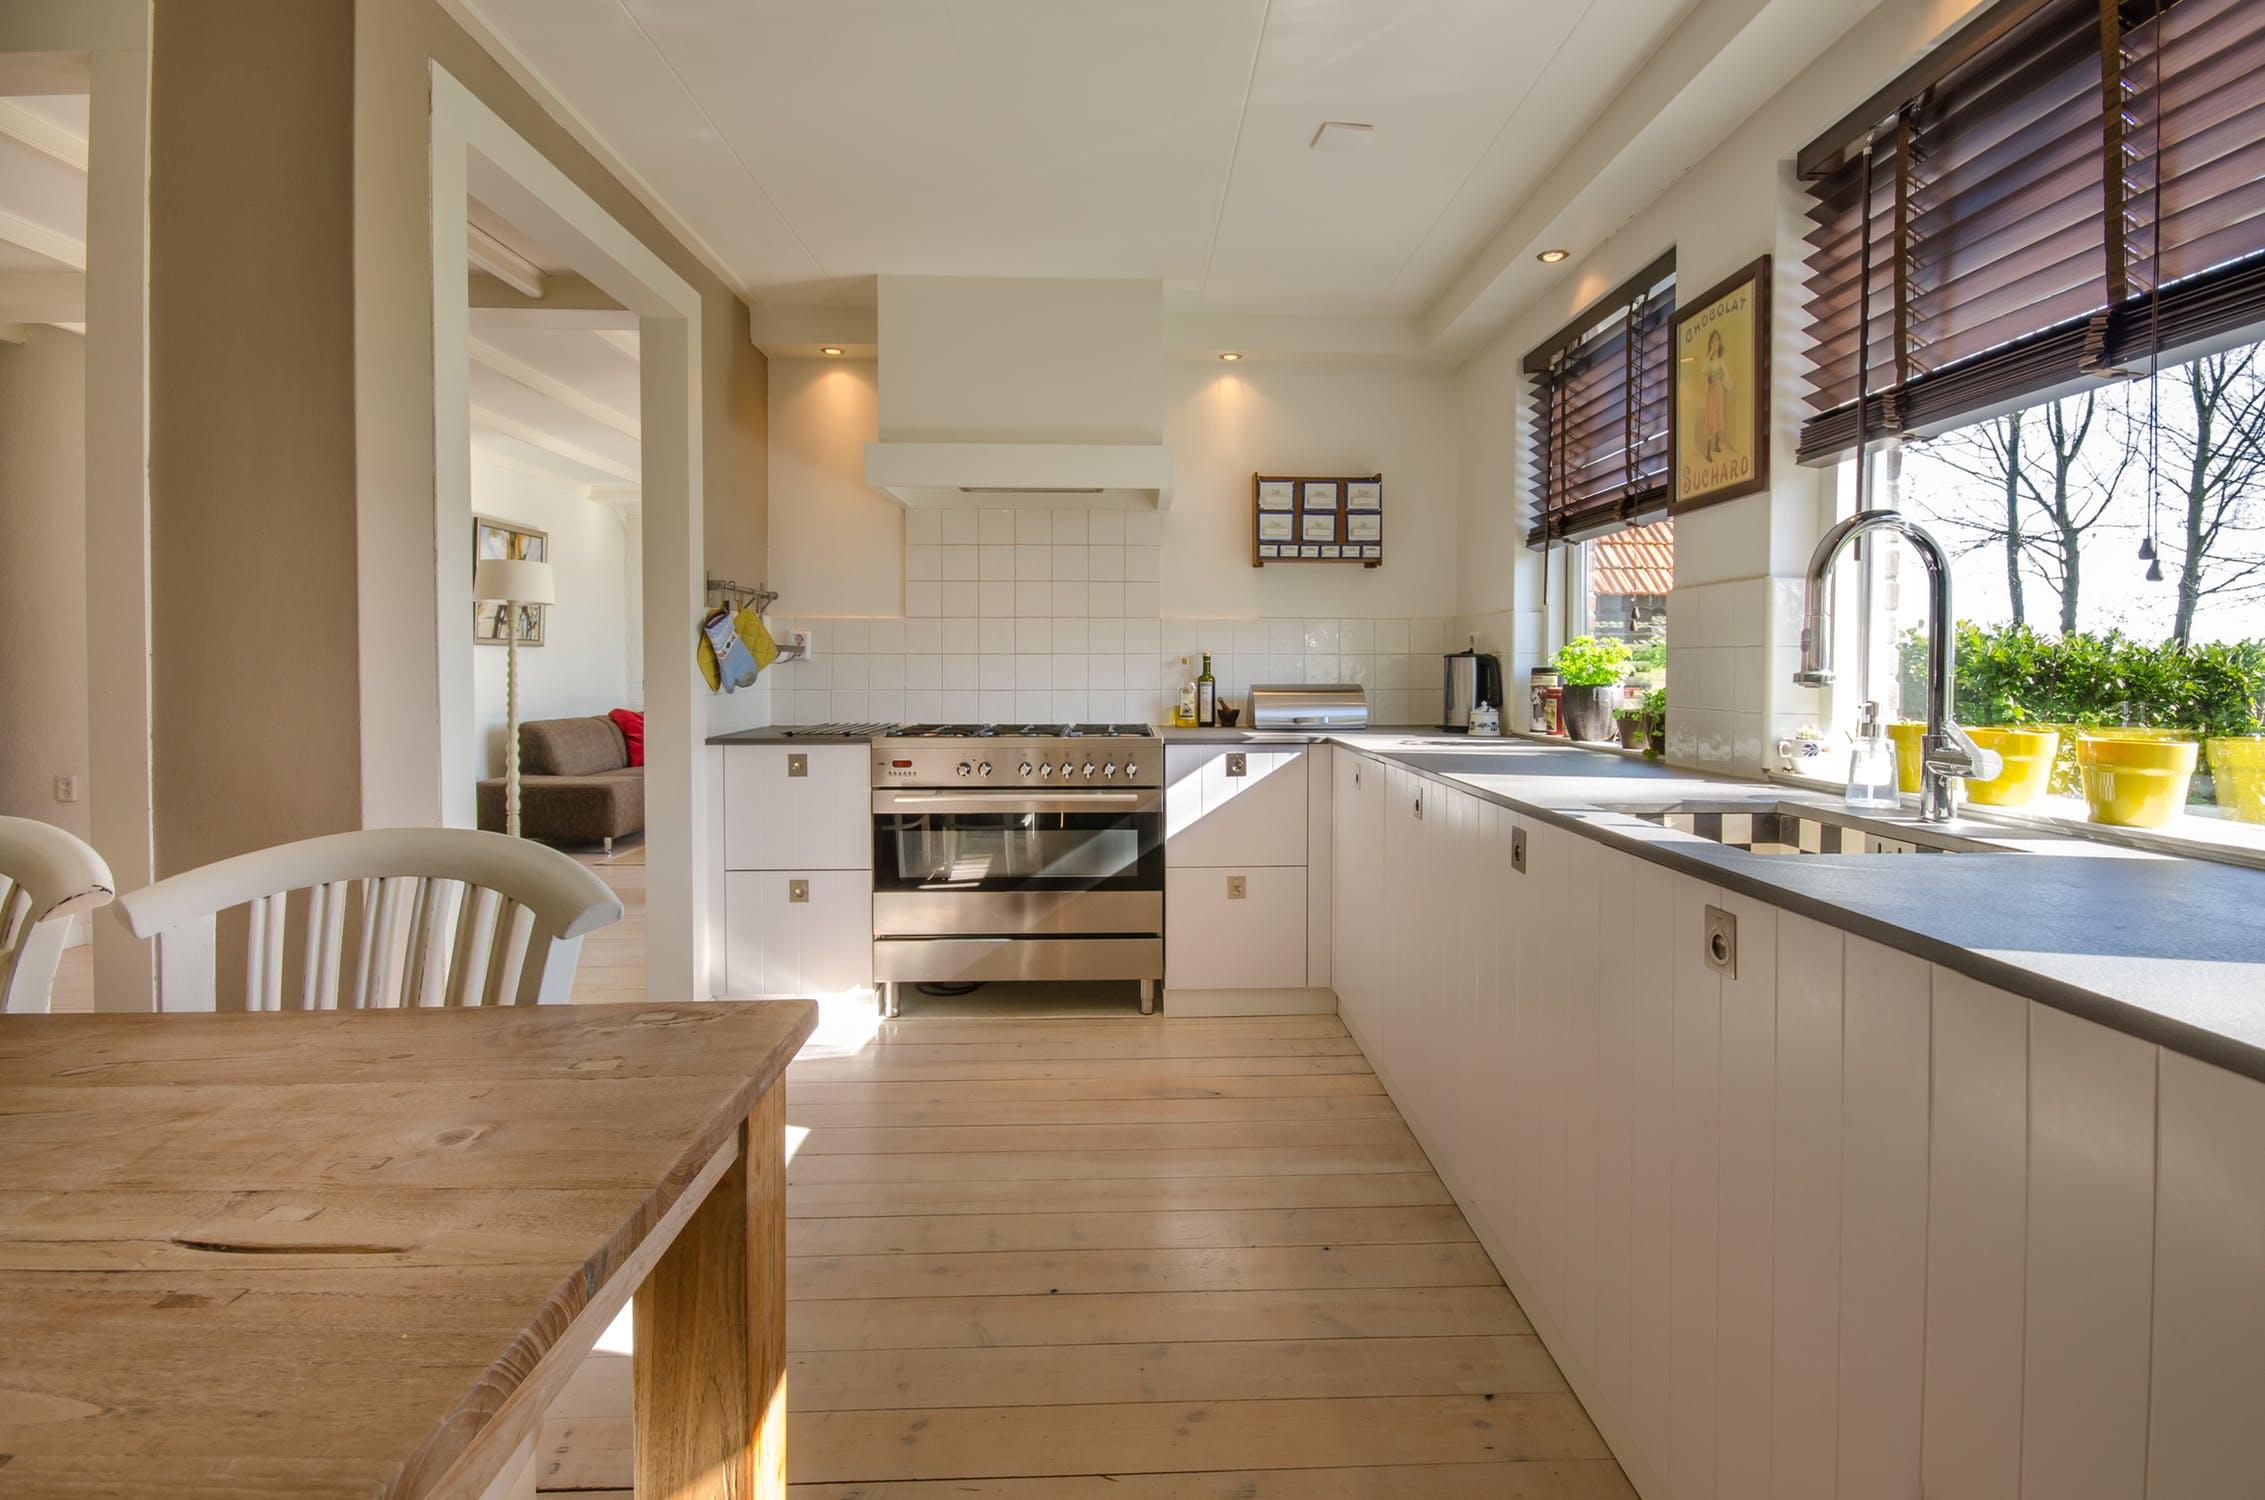 kitchen-stove-sink-kitchen-counter-349749